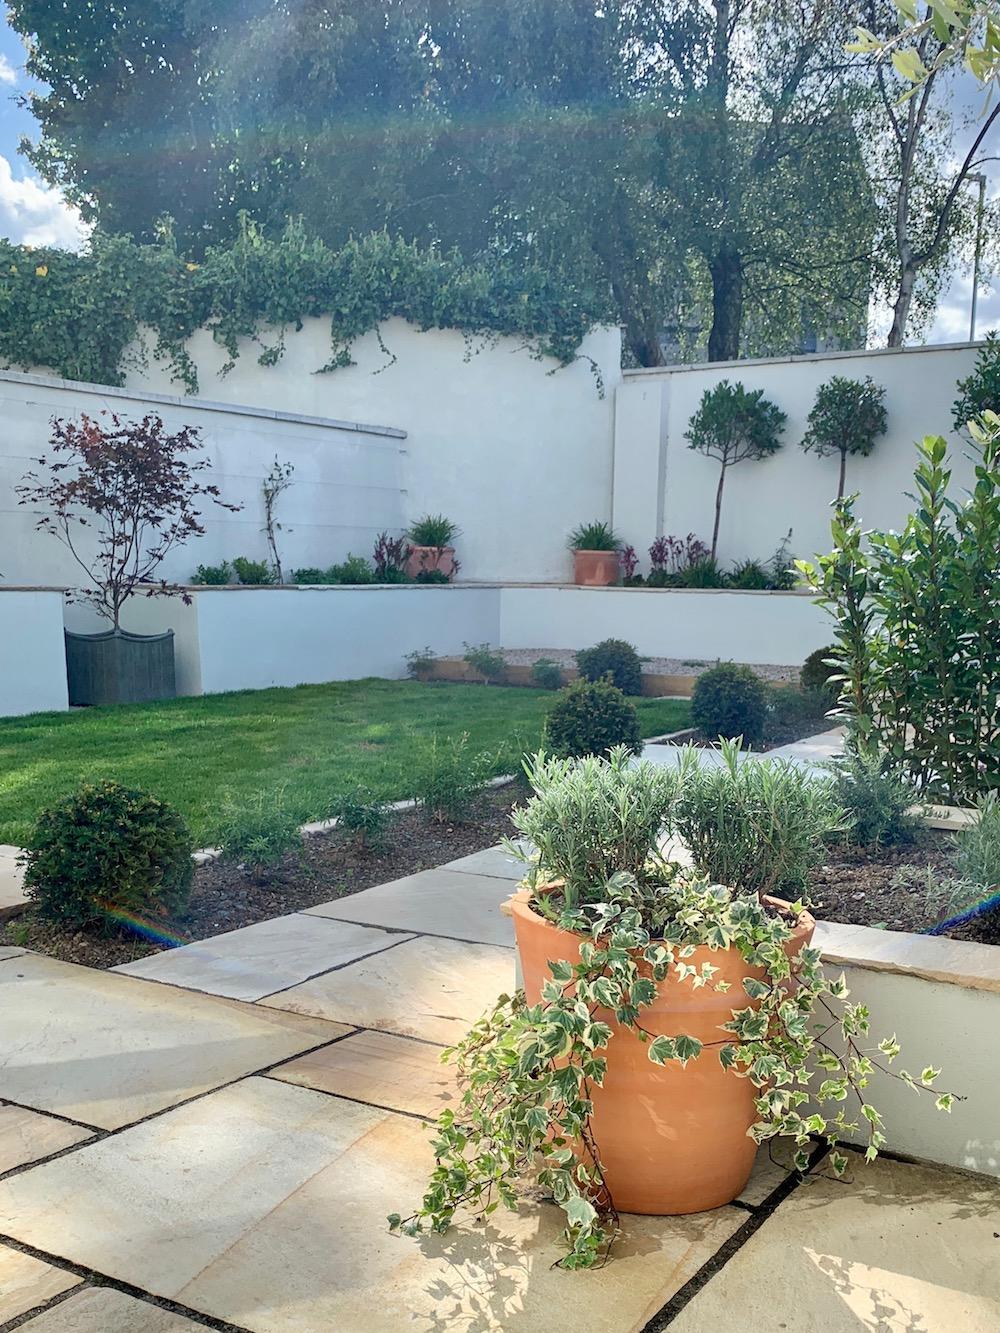 alex-alexandra-hollingsworth-garden-design-london-glenageary.jpg